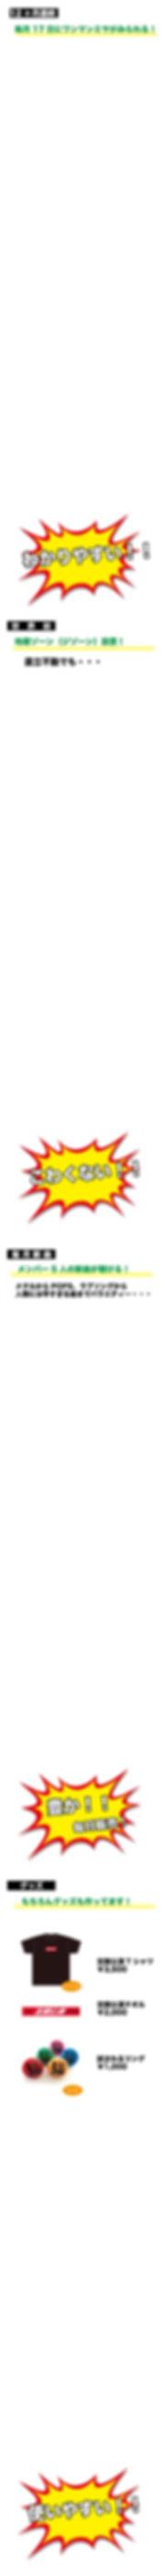 tokusetsu_3.jpg